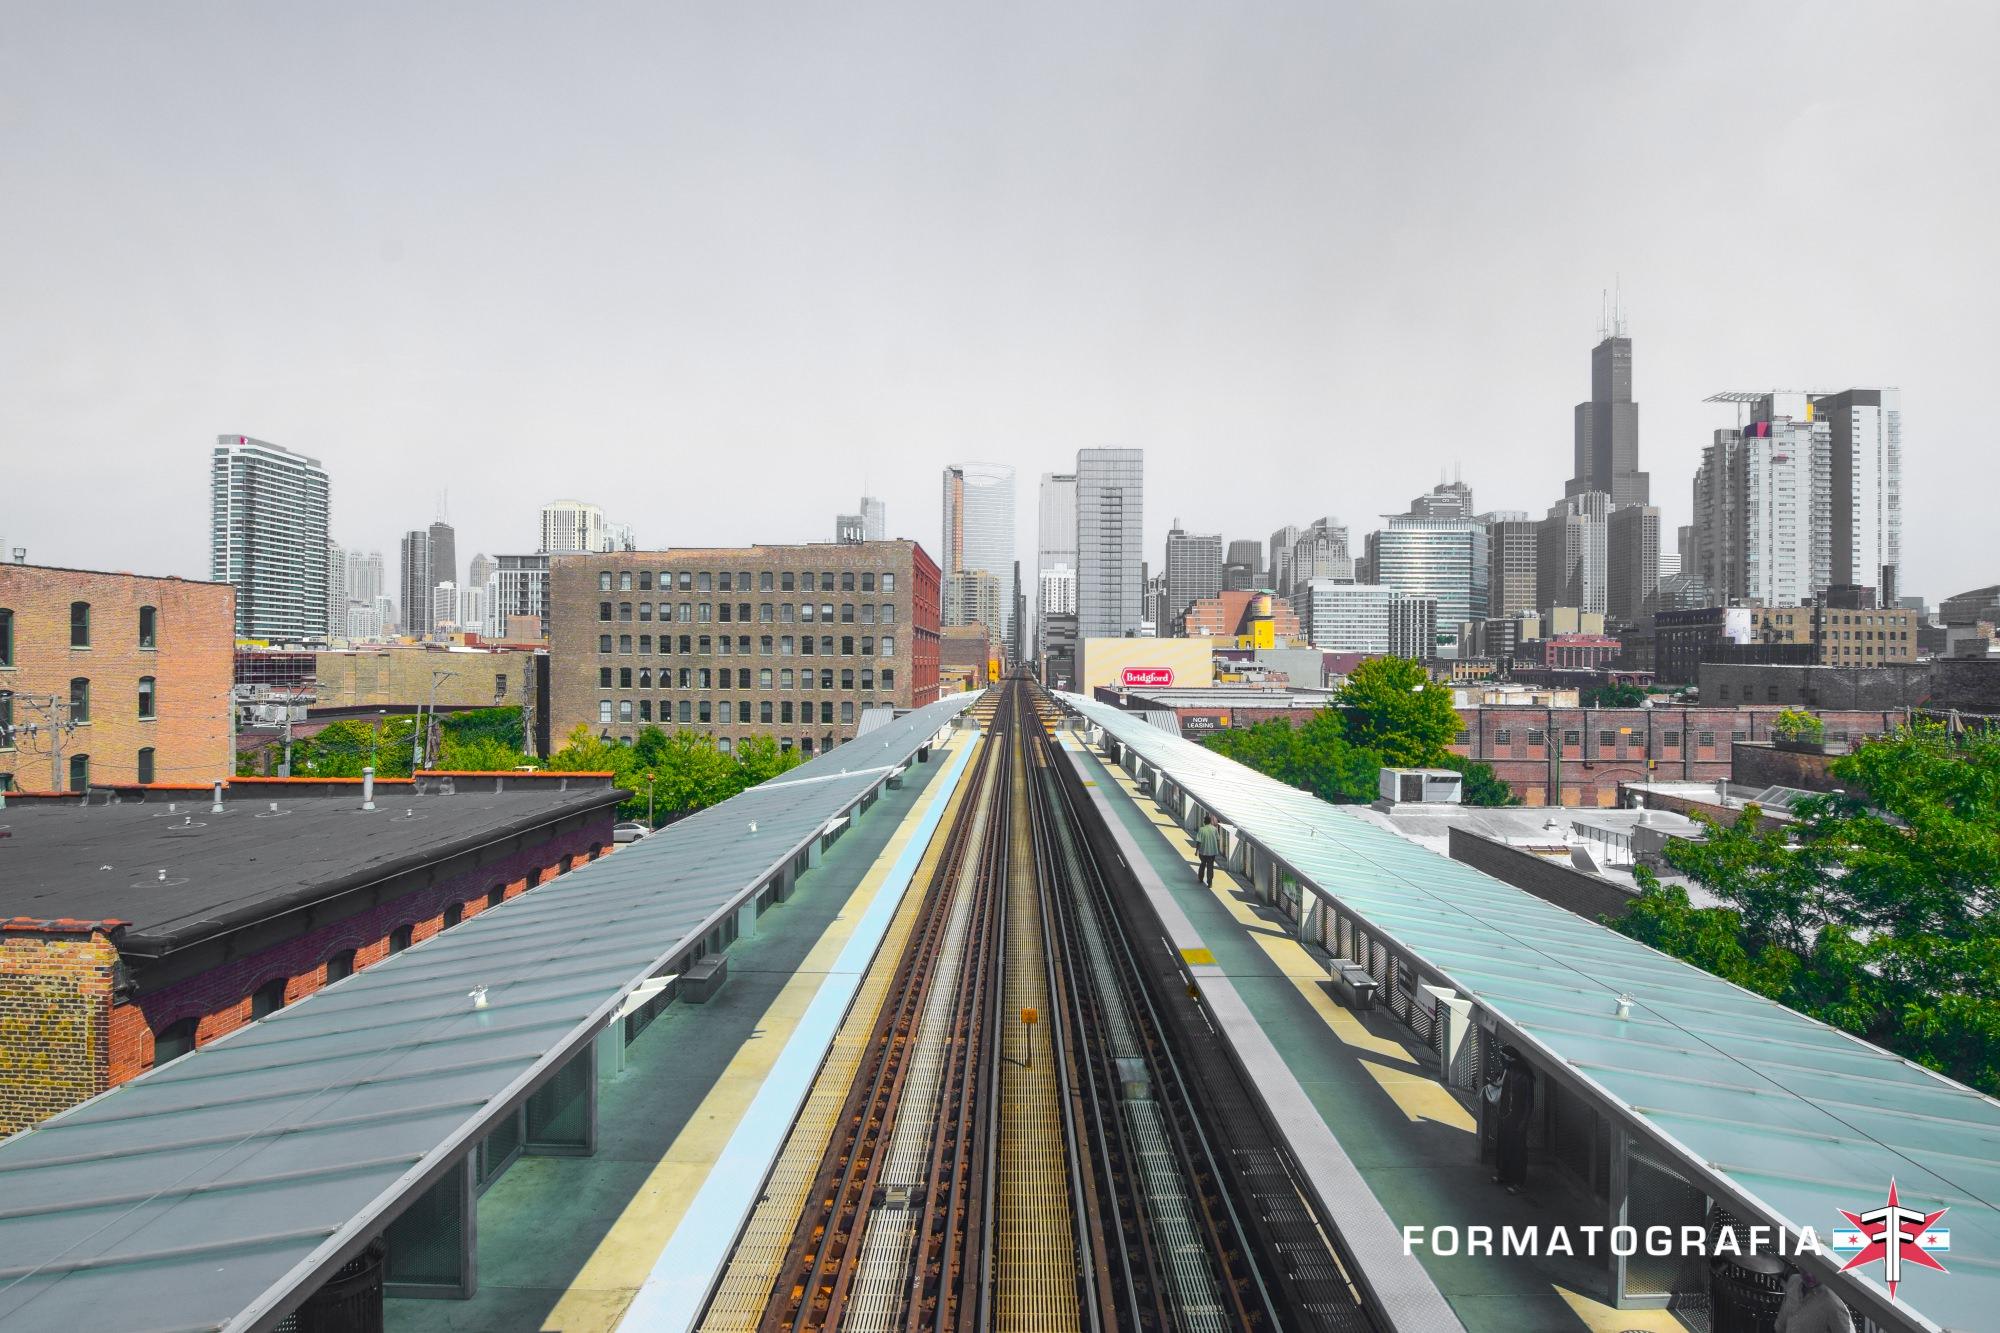 eric formato chicago photographer fall update city architecture shotsDSC_0250.jpg